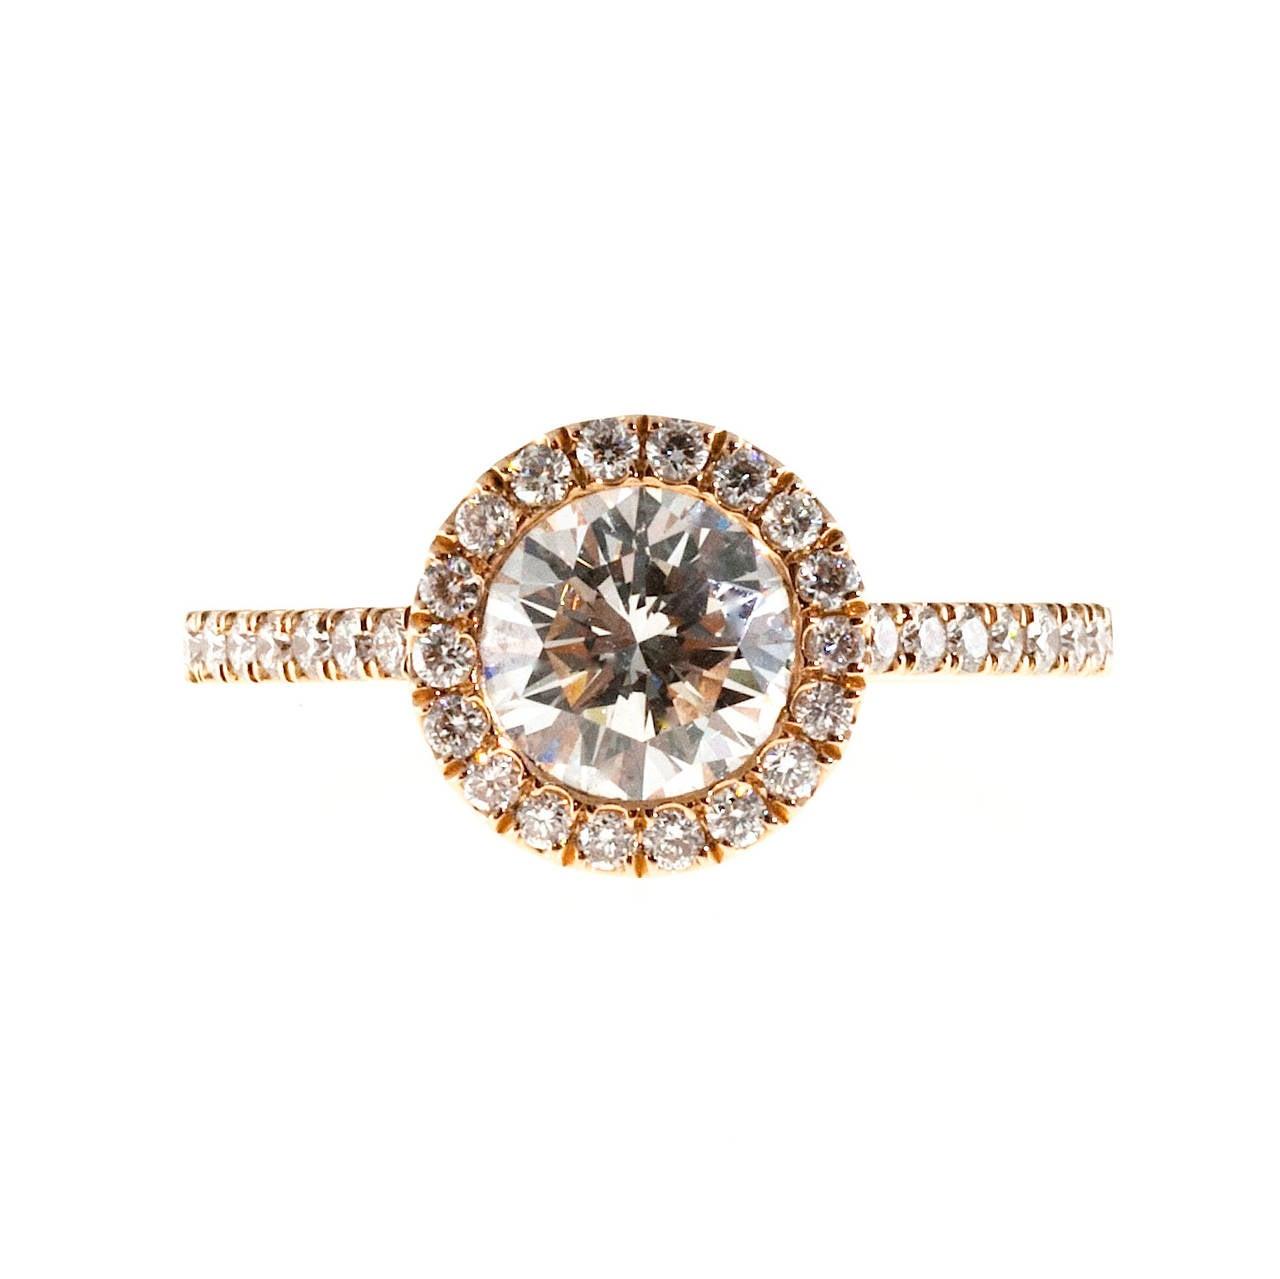 Peter Suchy GIA Certified 1.06 Carat Diamond Halo Rose Gold Engagement Ring 2